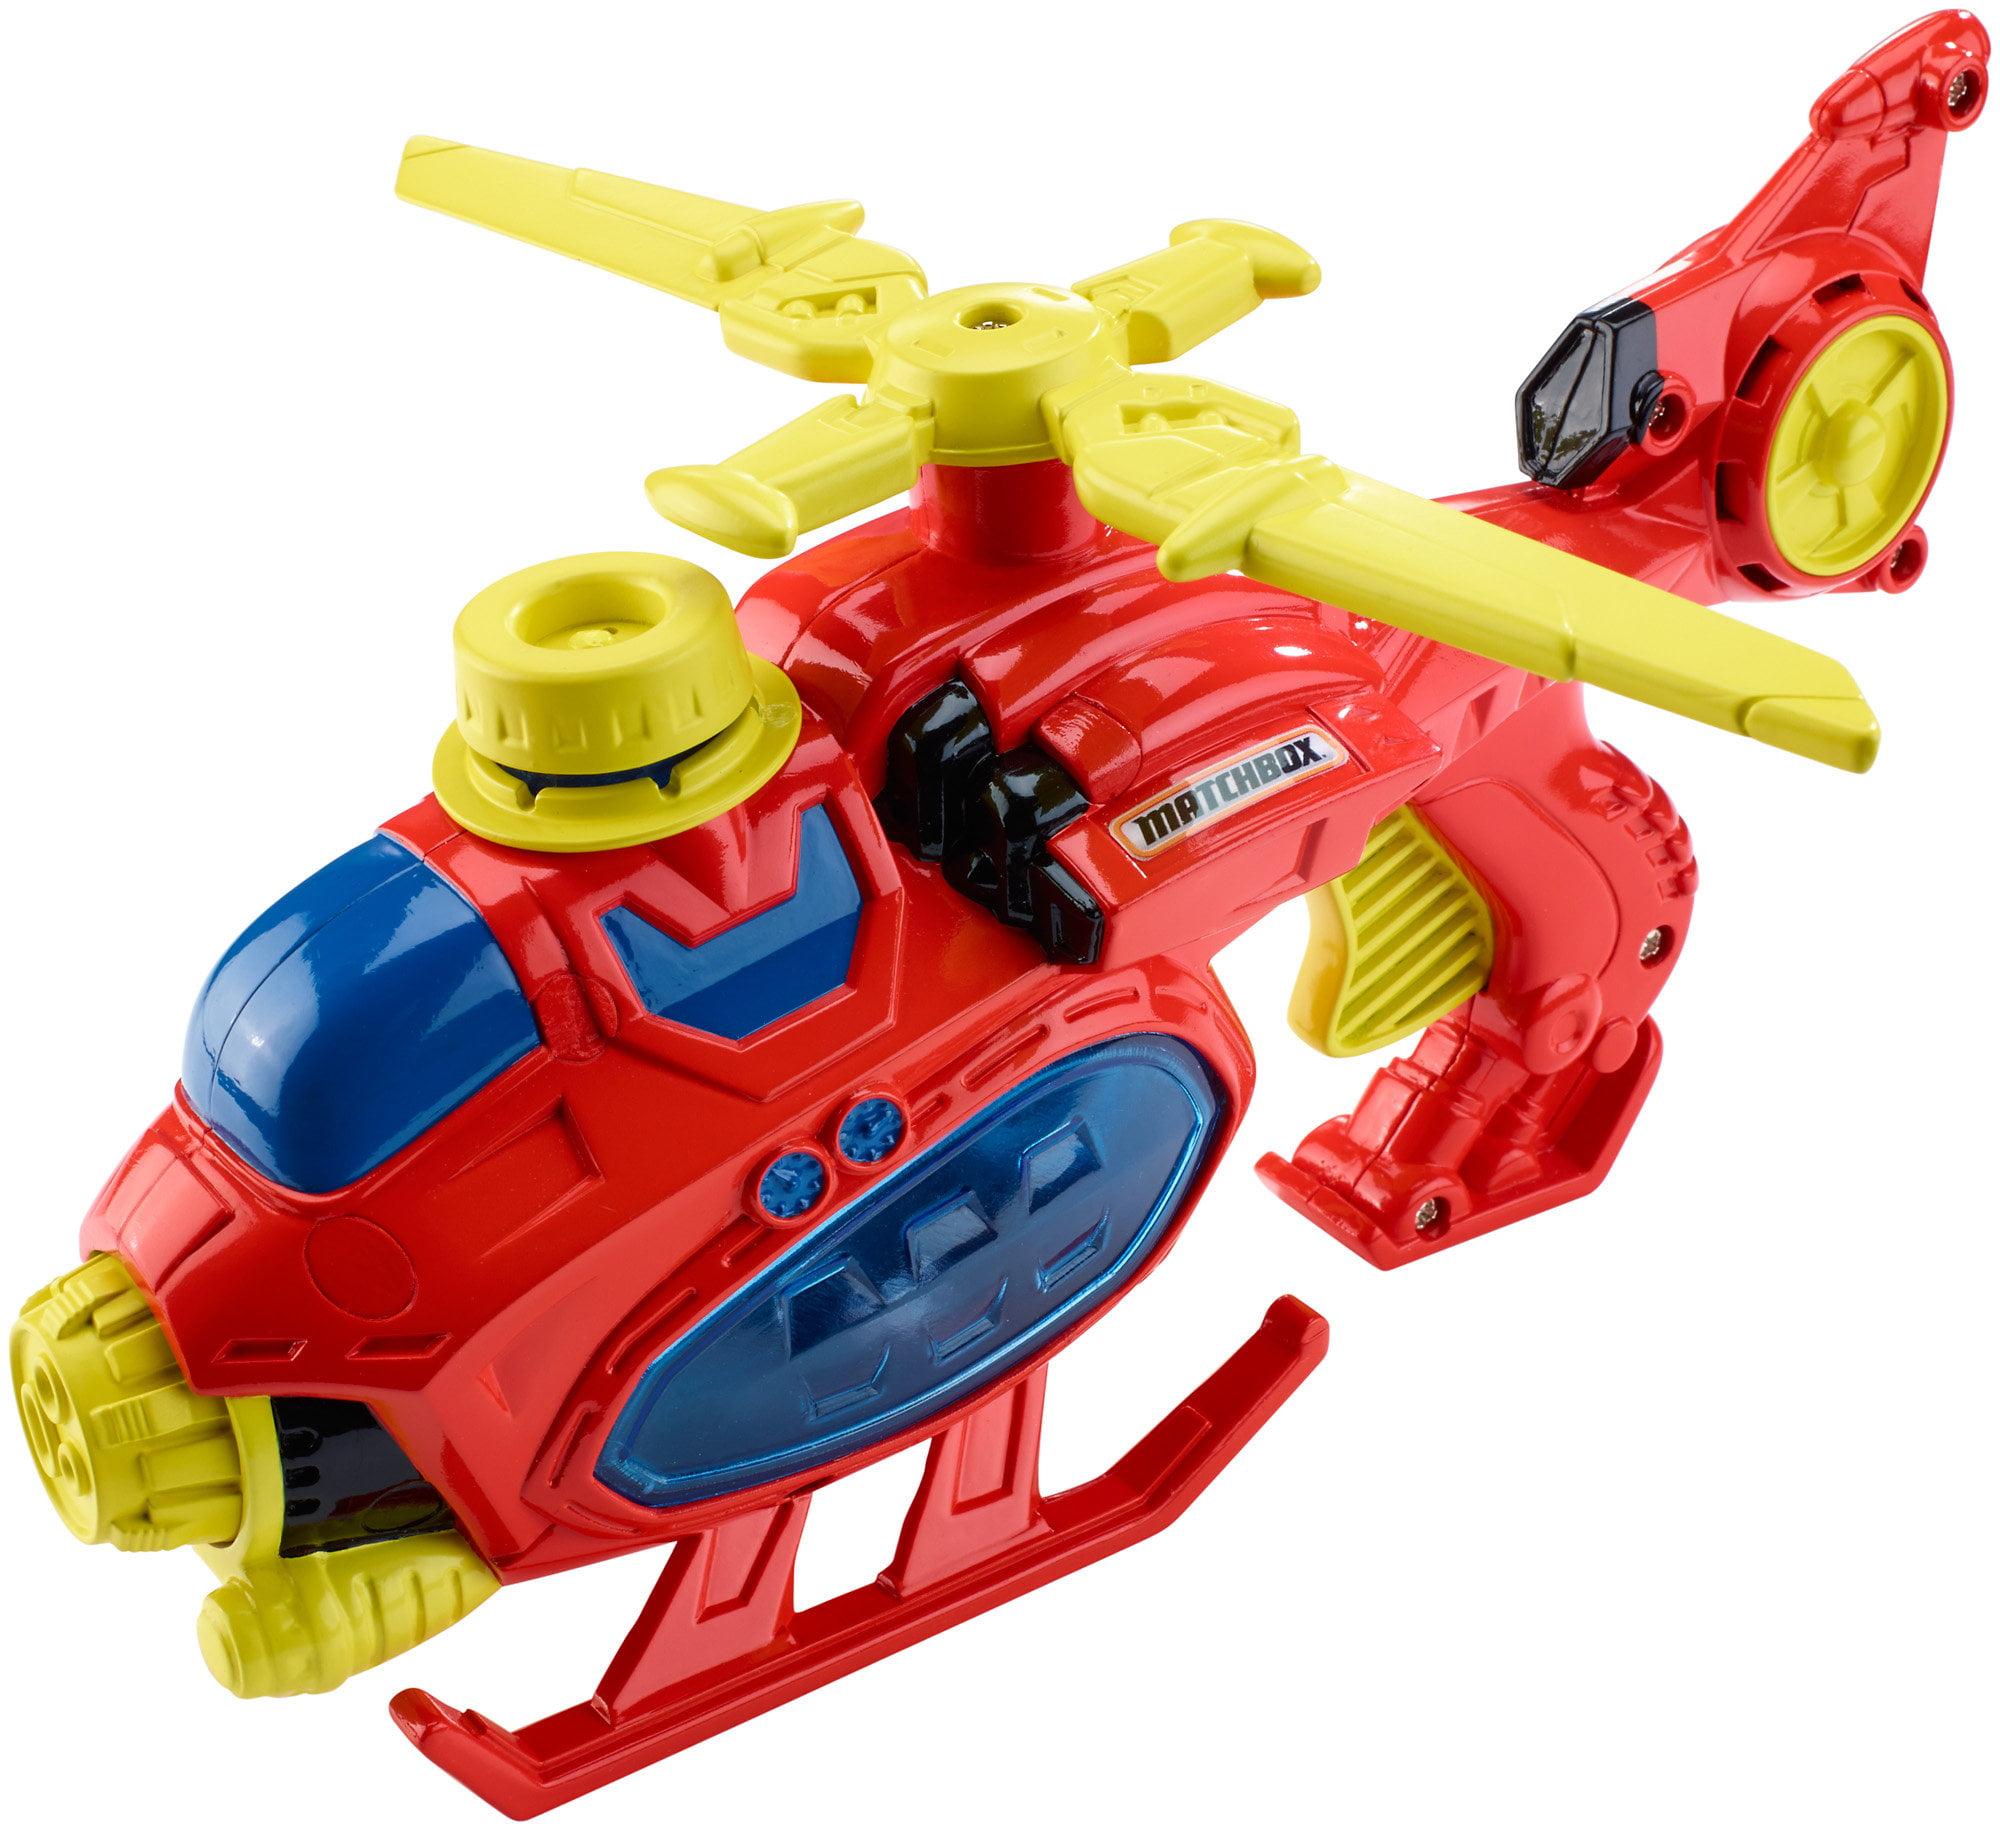 Matchbox Firefighter Aqua Chopper with Water Cannon